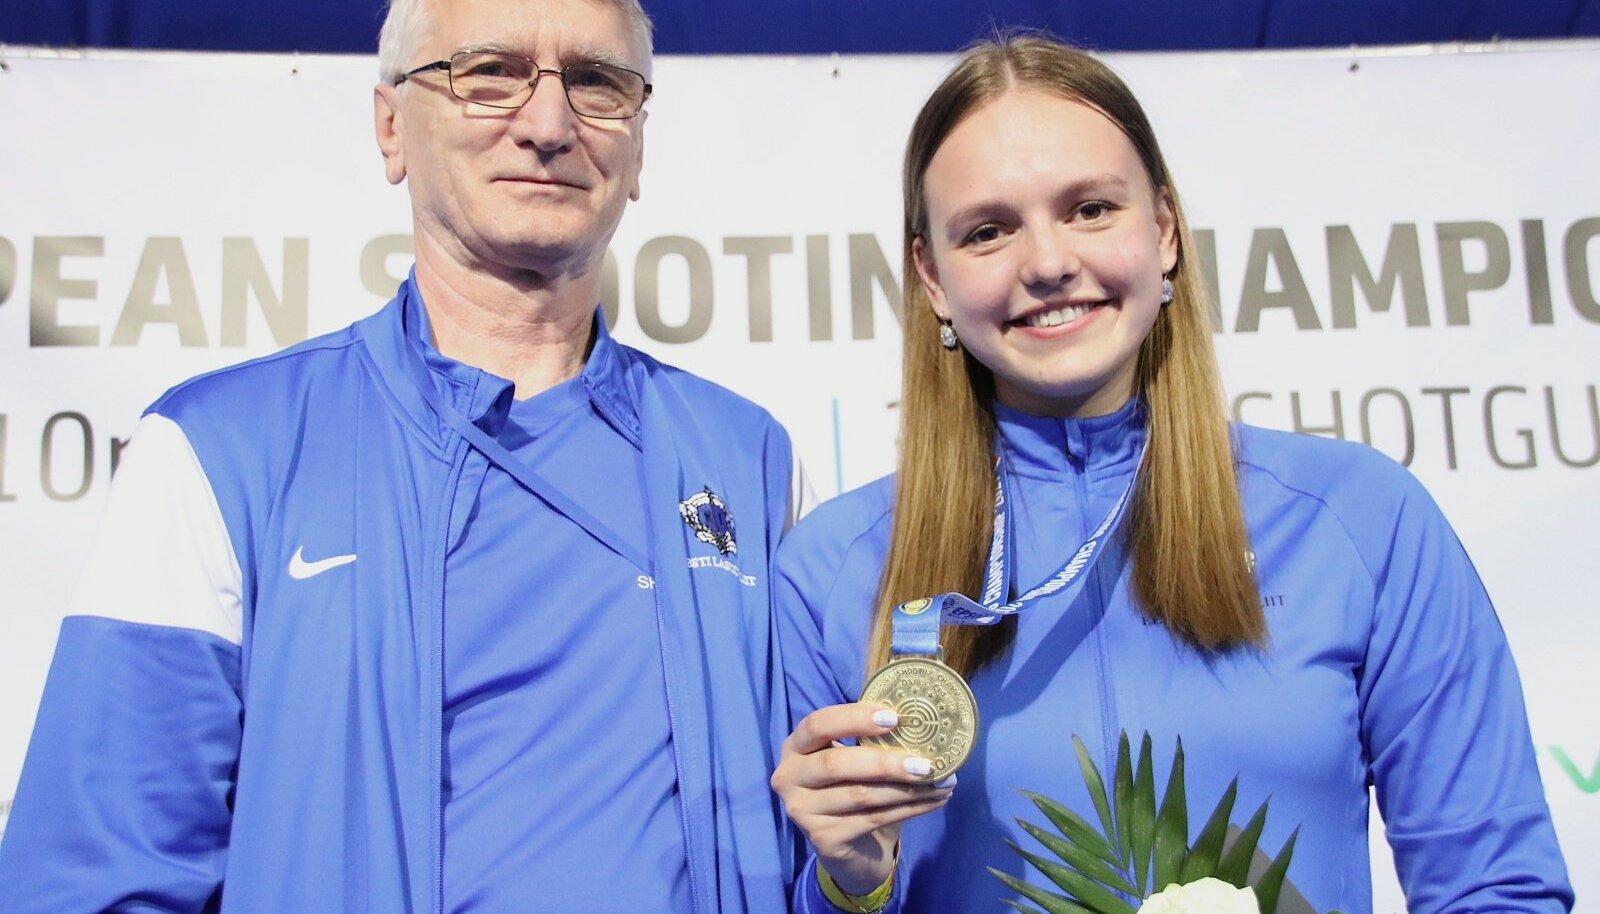 Katrin Smirnova koos treeneri Aleksandr Makaroviga.